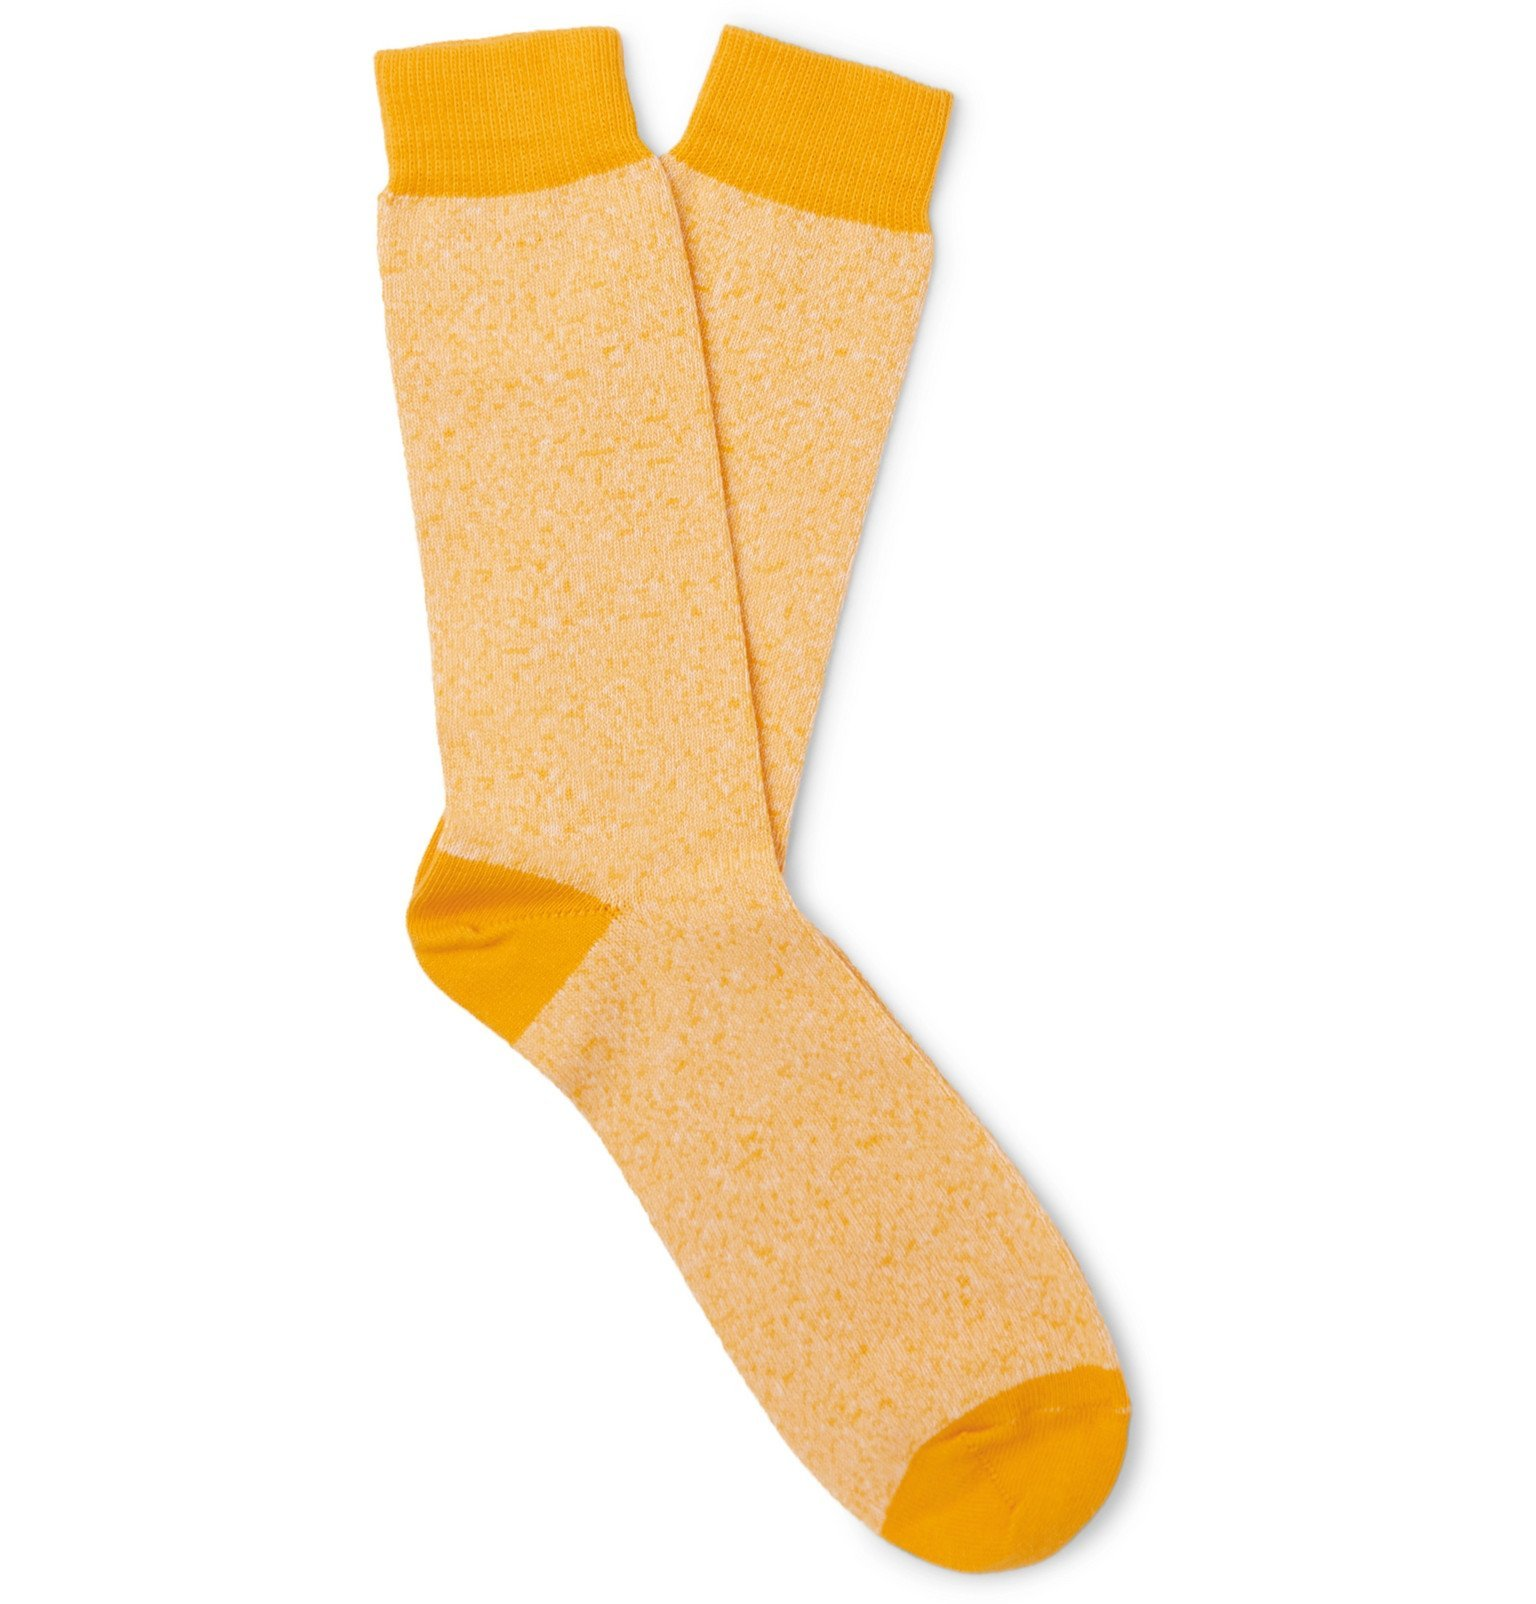 Sunspel - Mélange Organic Cotton-Blend Socks - Yellow